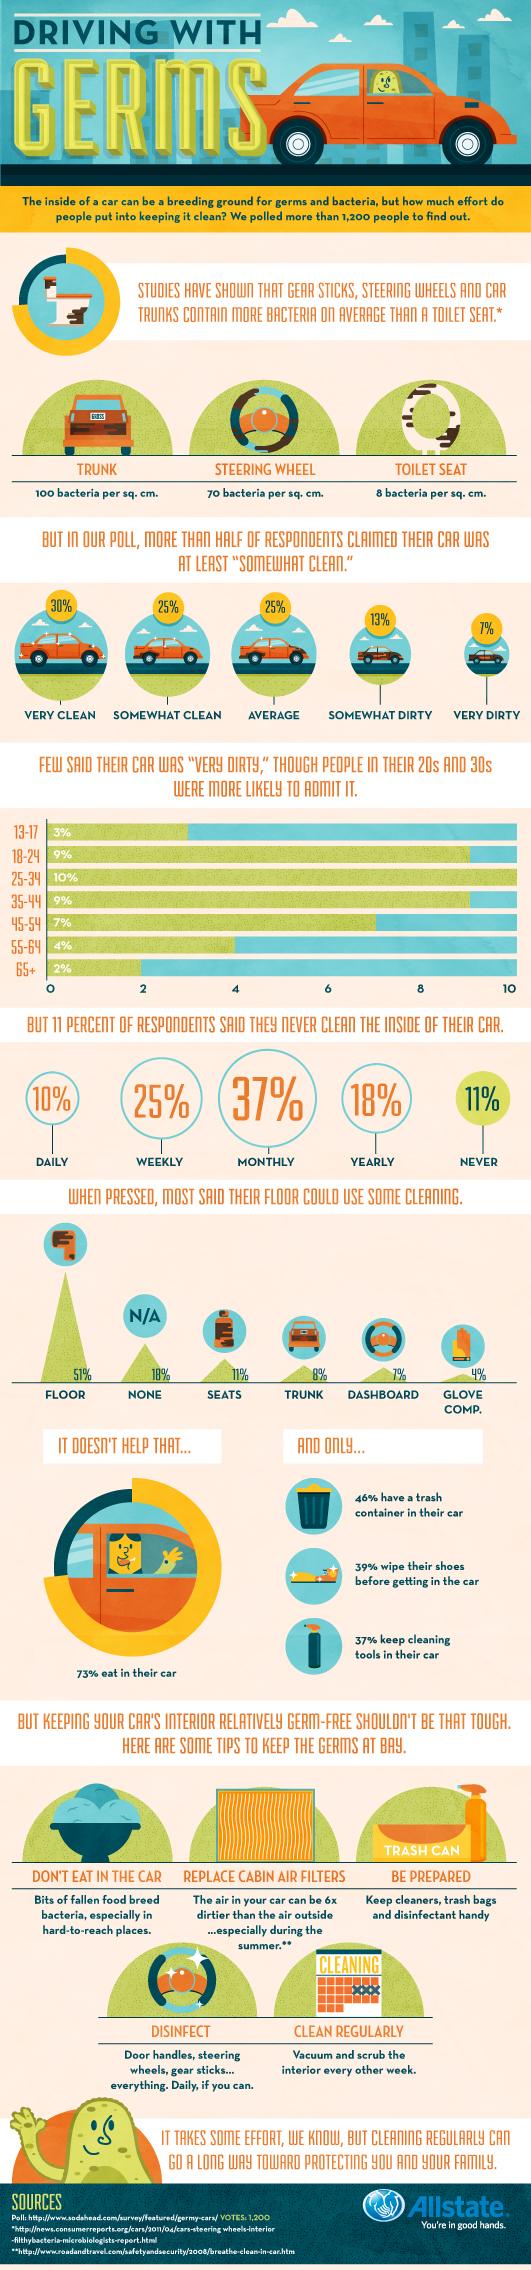 Allstate: Infographic